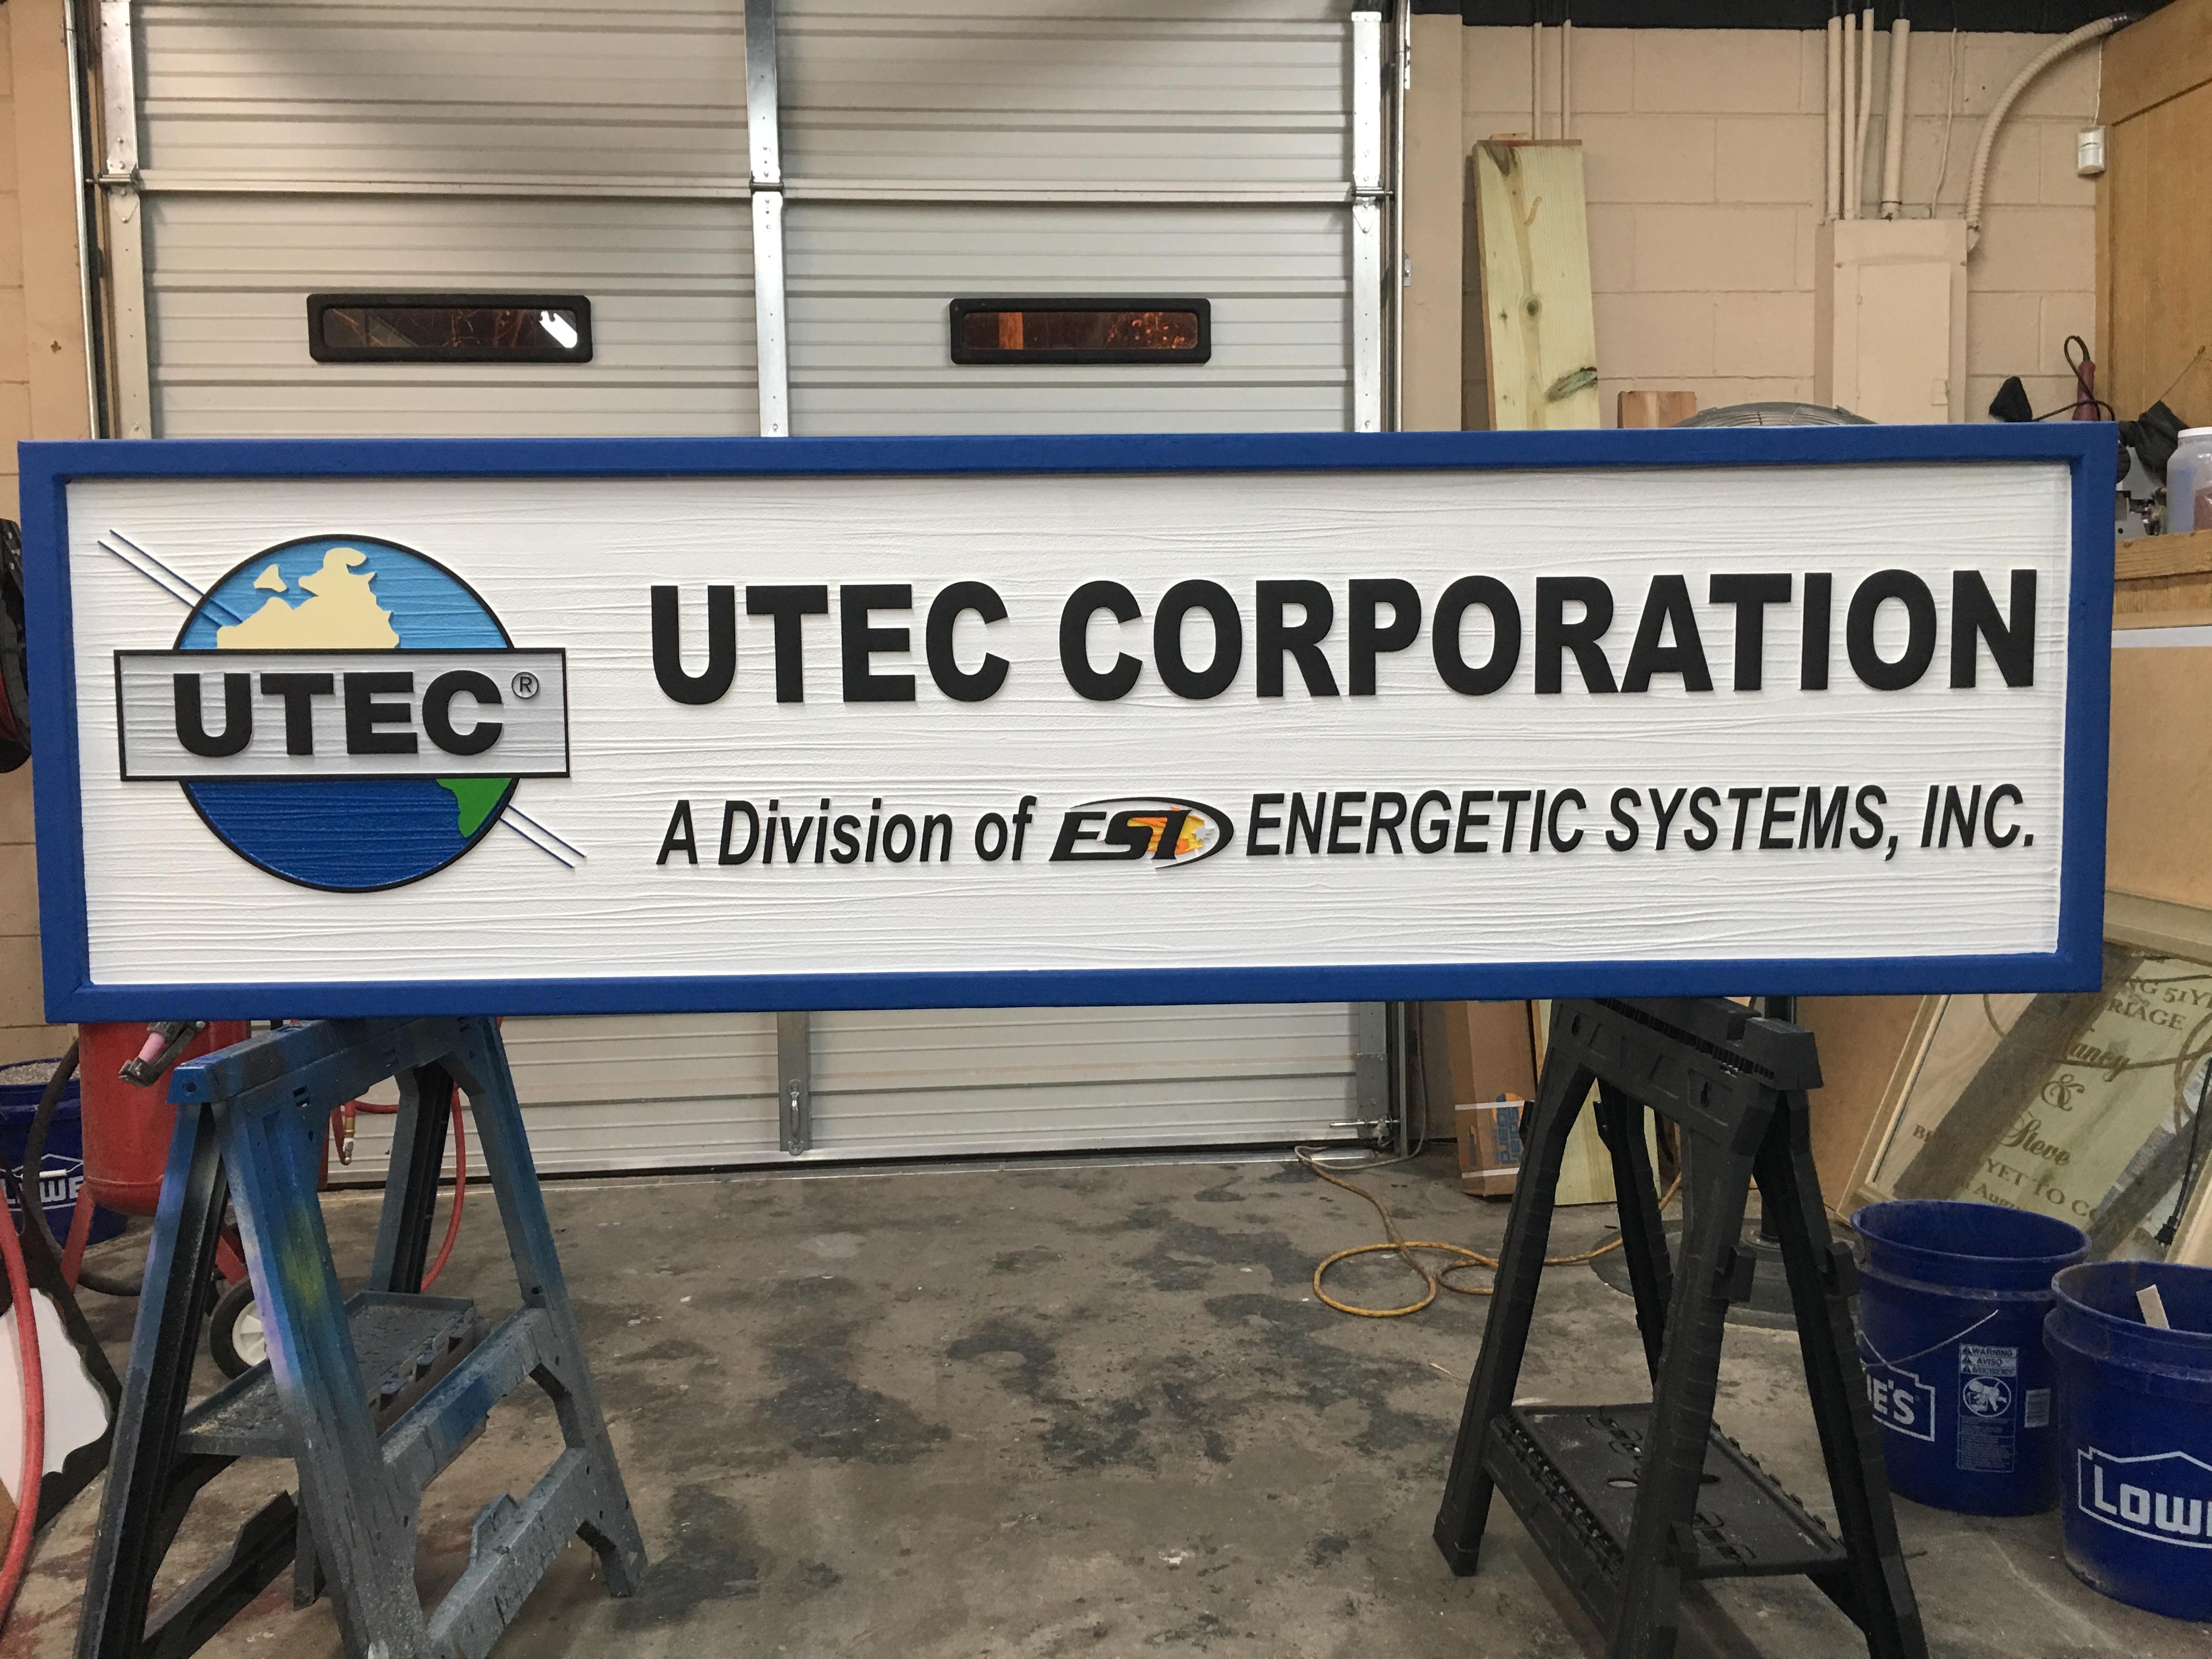 UTEC Corporation